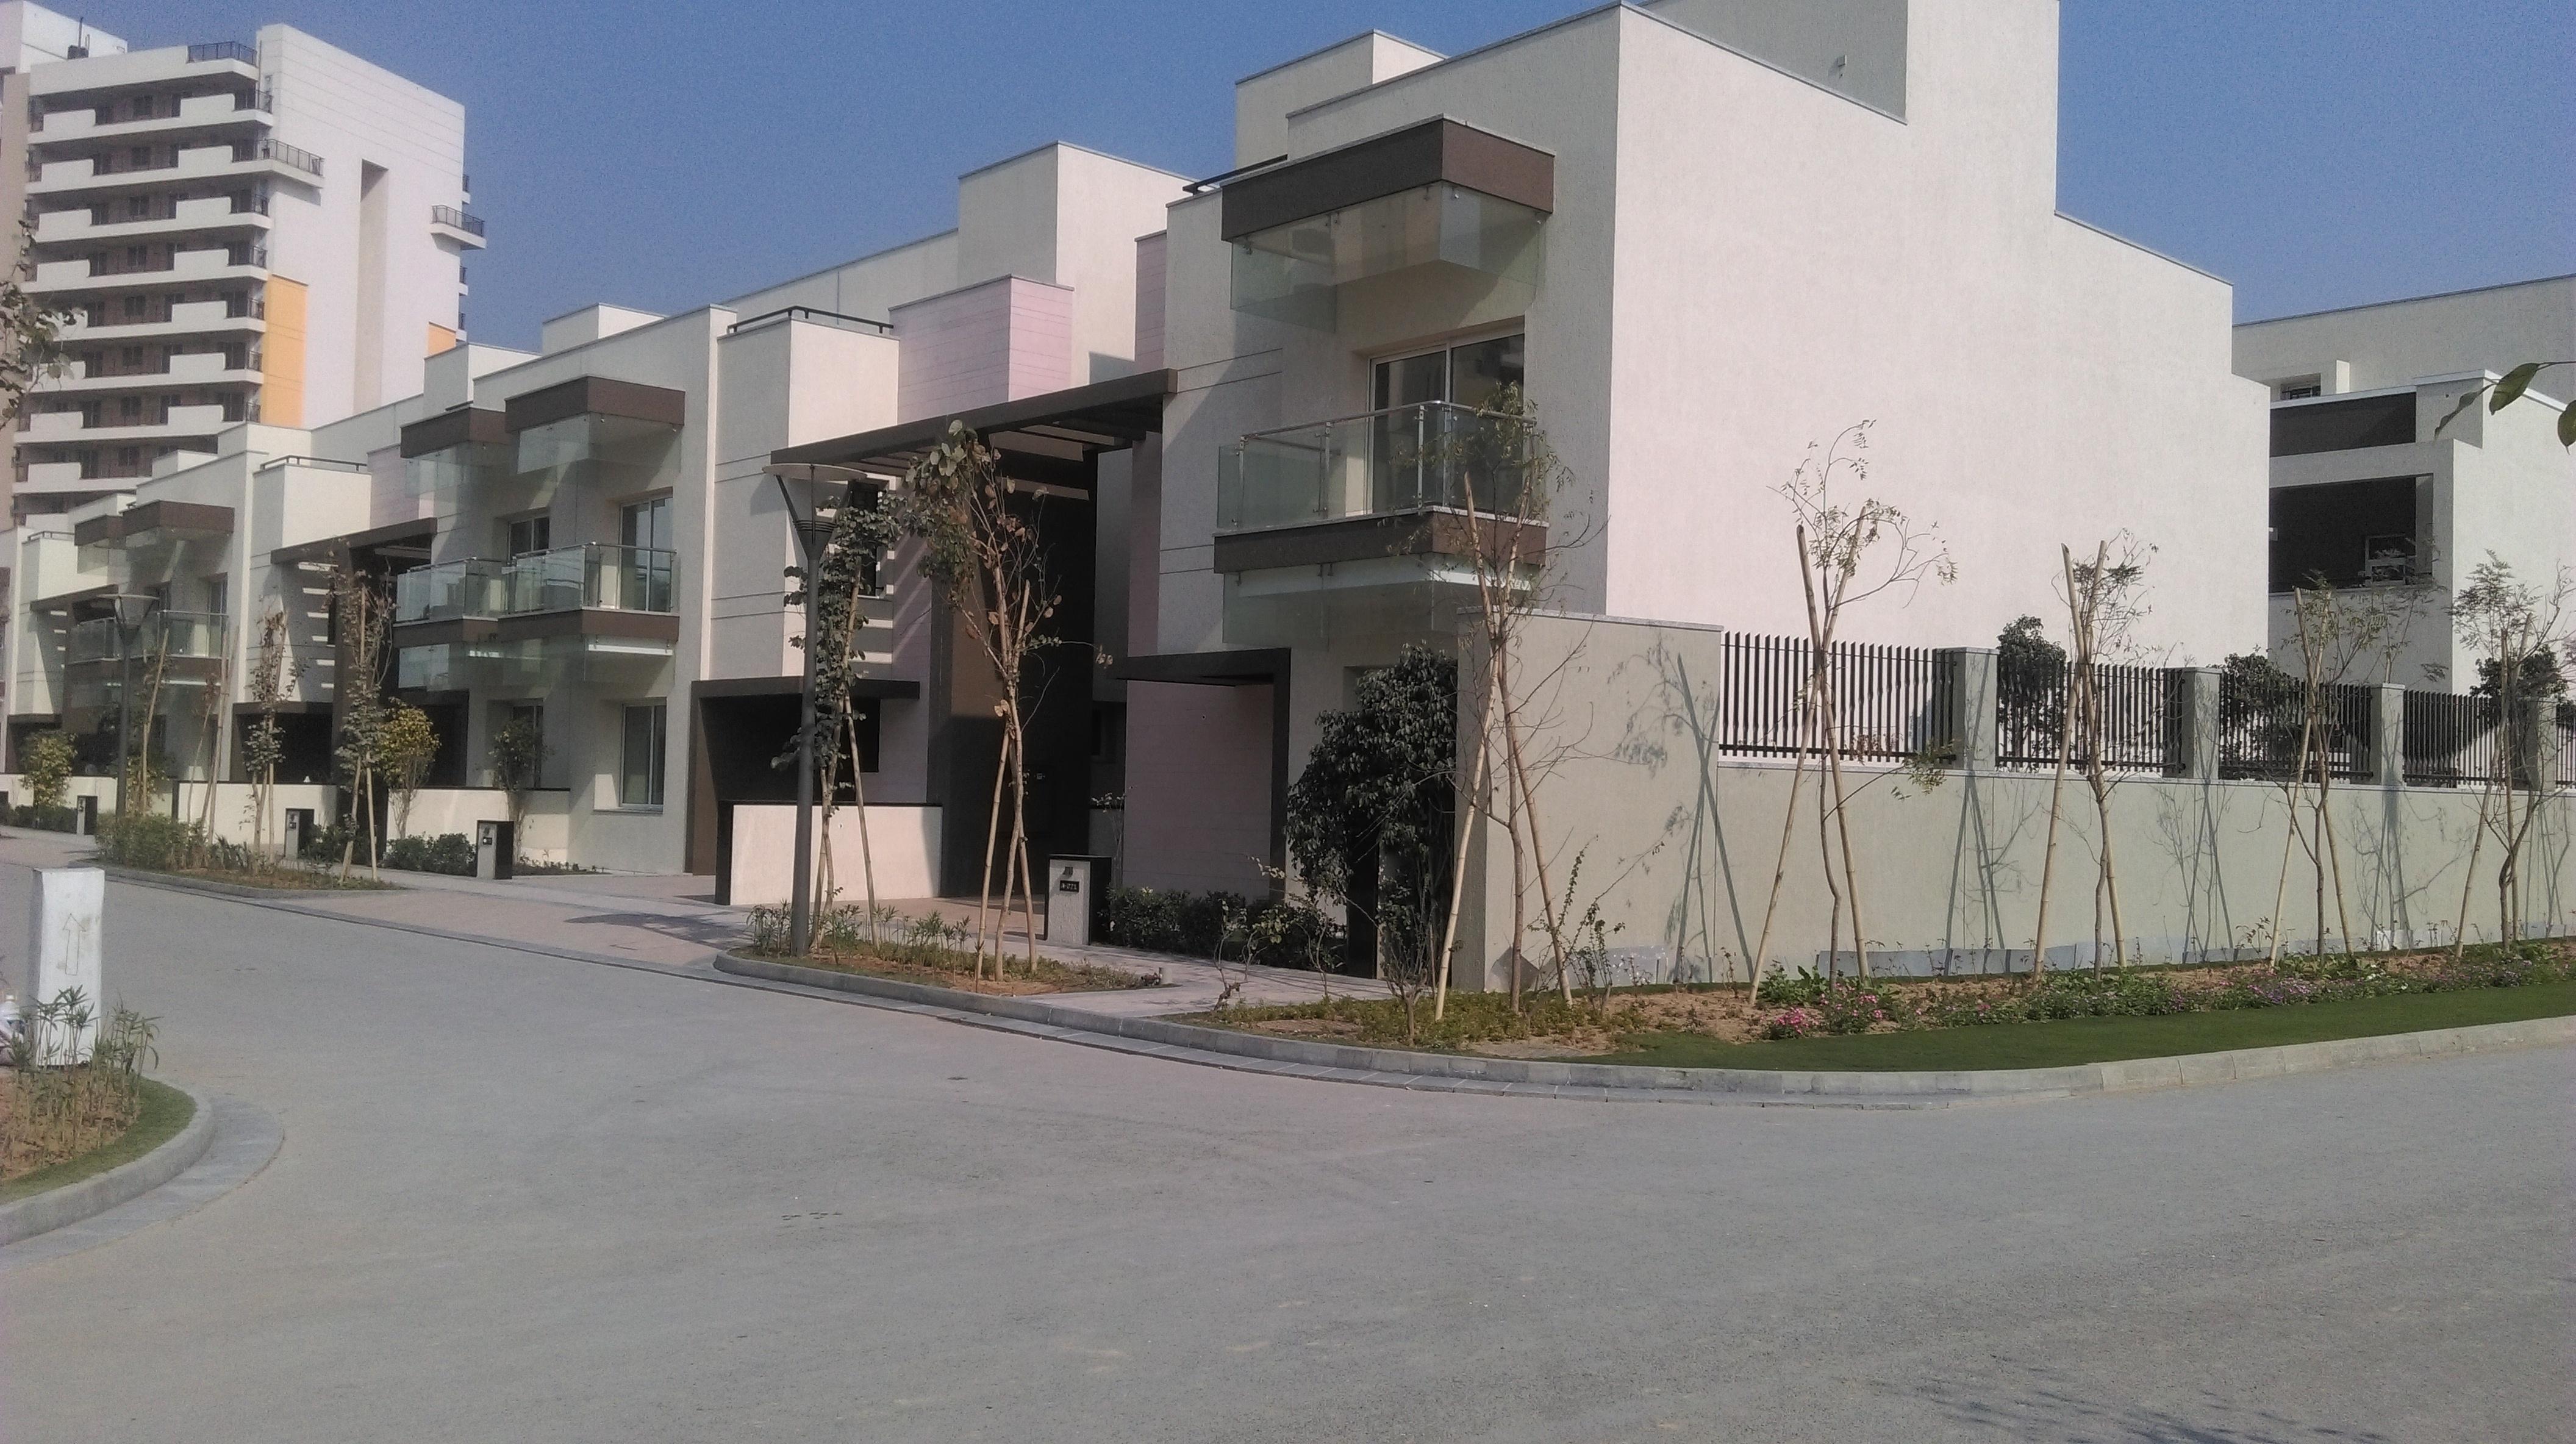 Villas ready for possession at Sobha International City